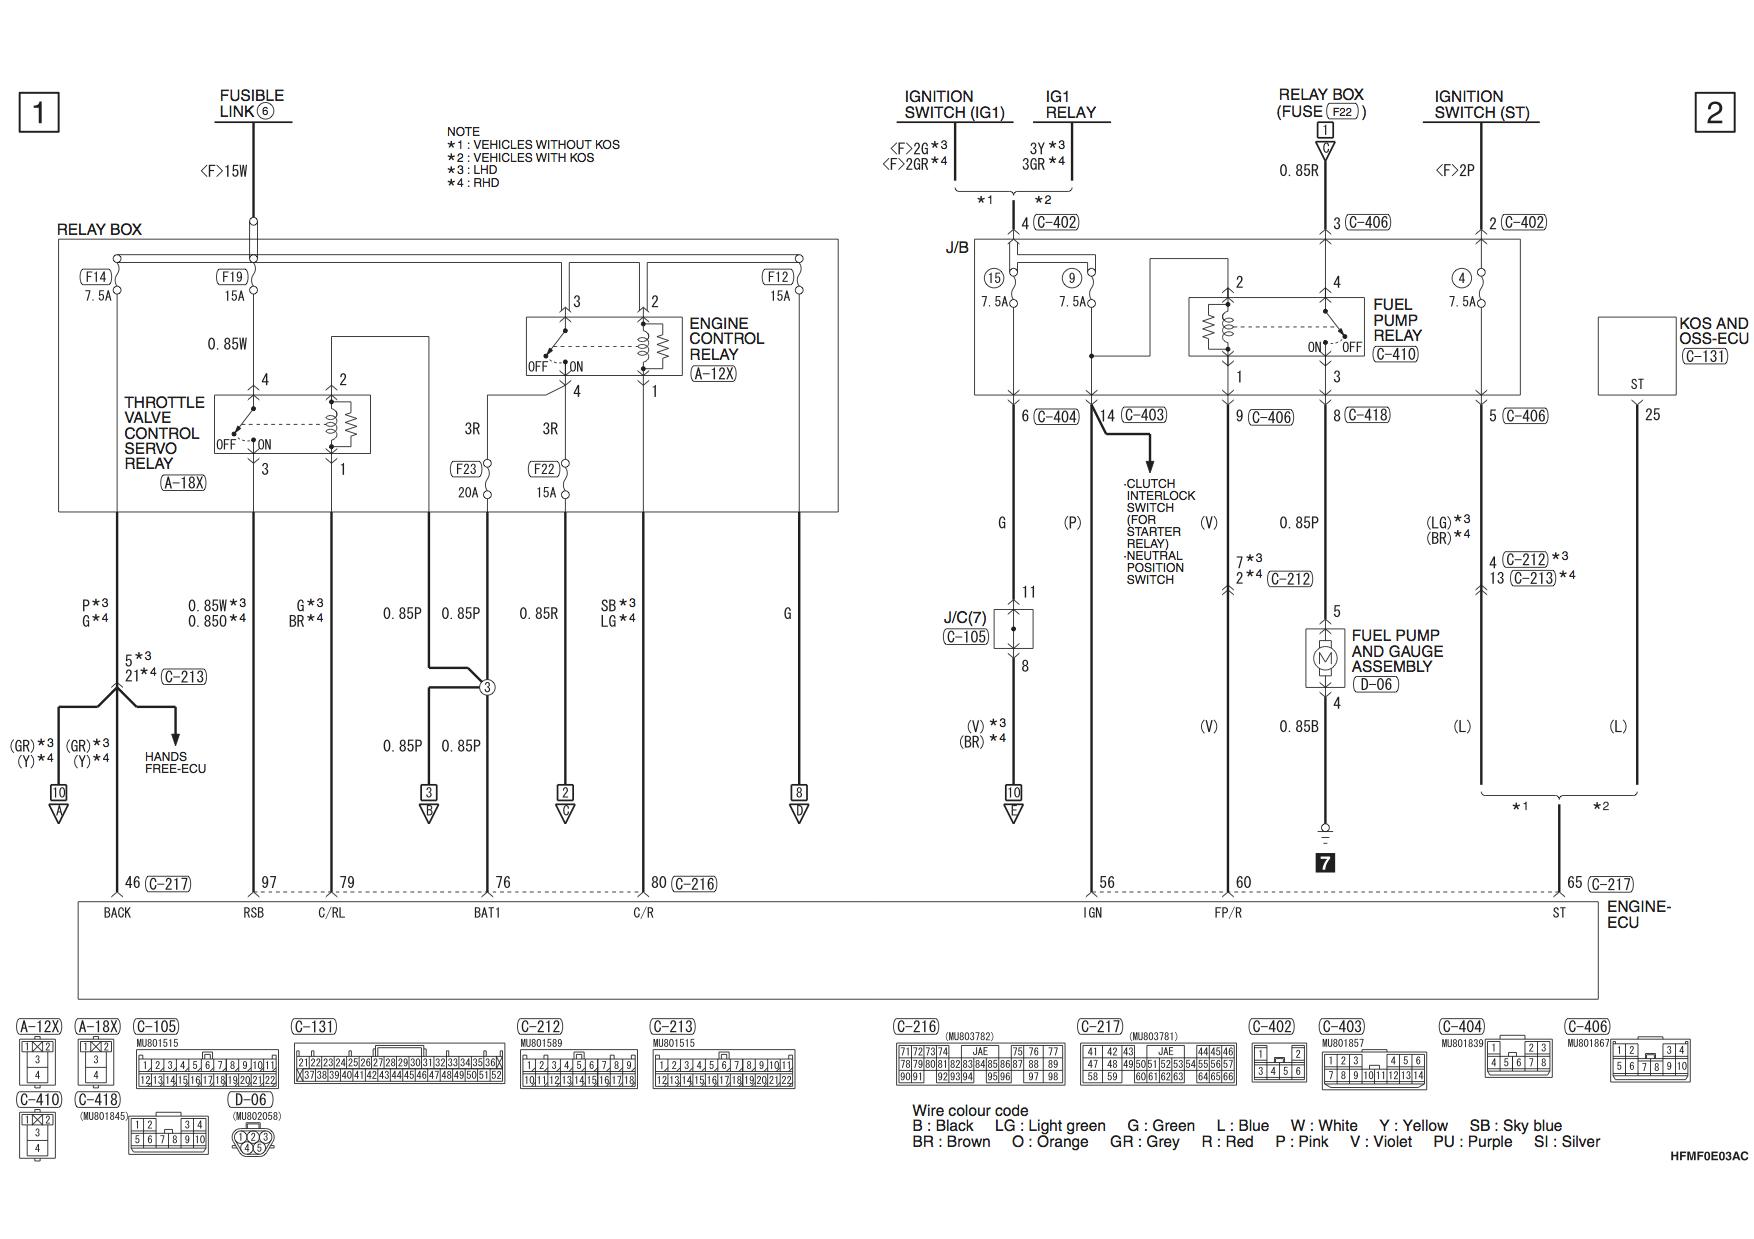 Mitsubishi Mirage 2 1.2 Petrol Circuit Diagrams